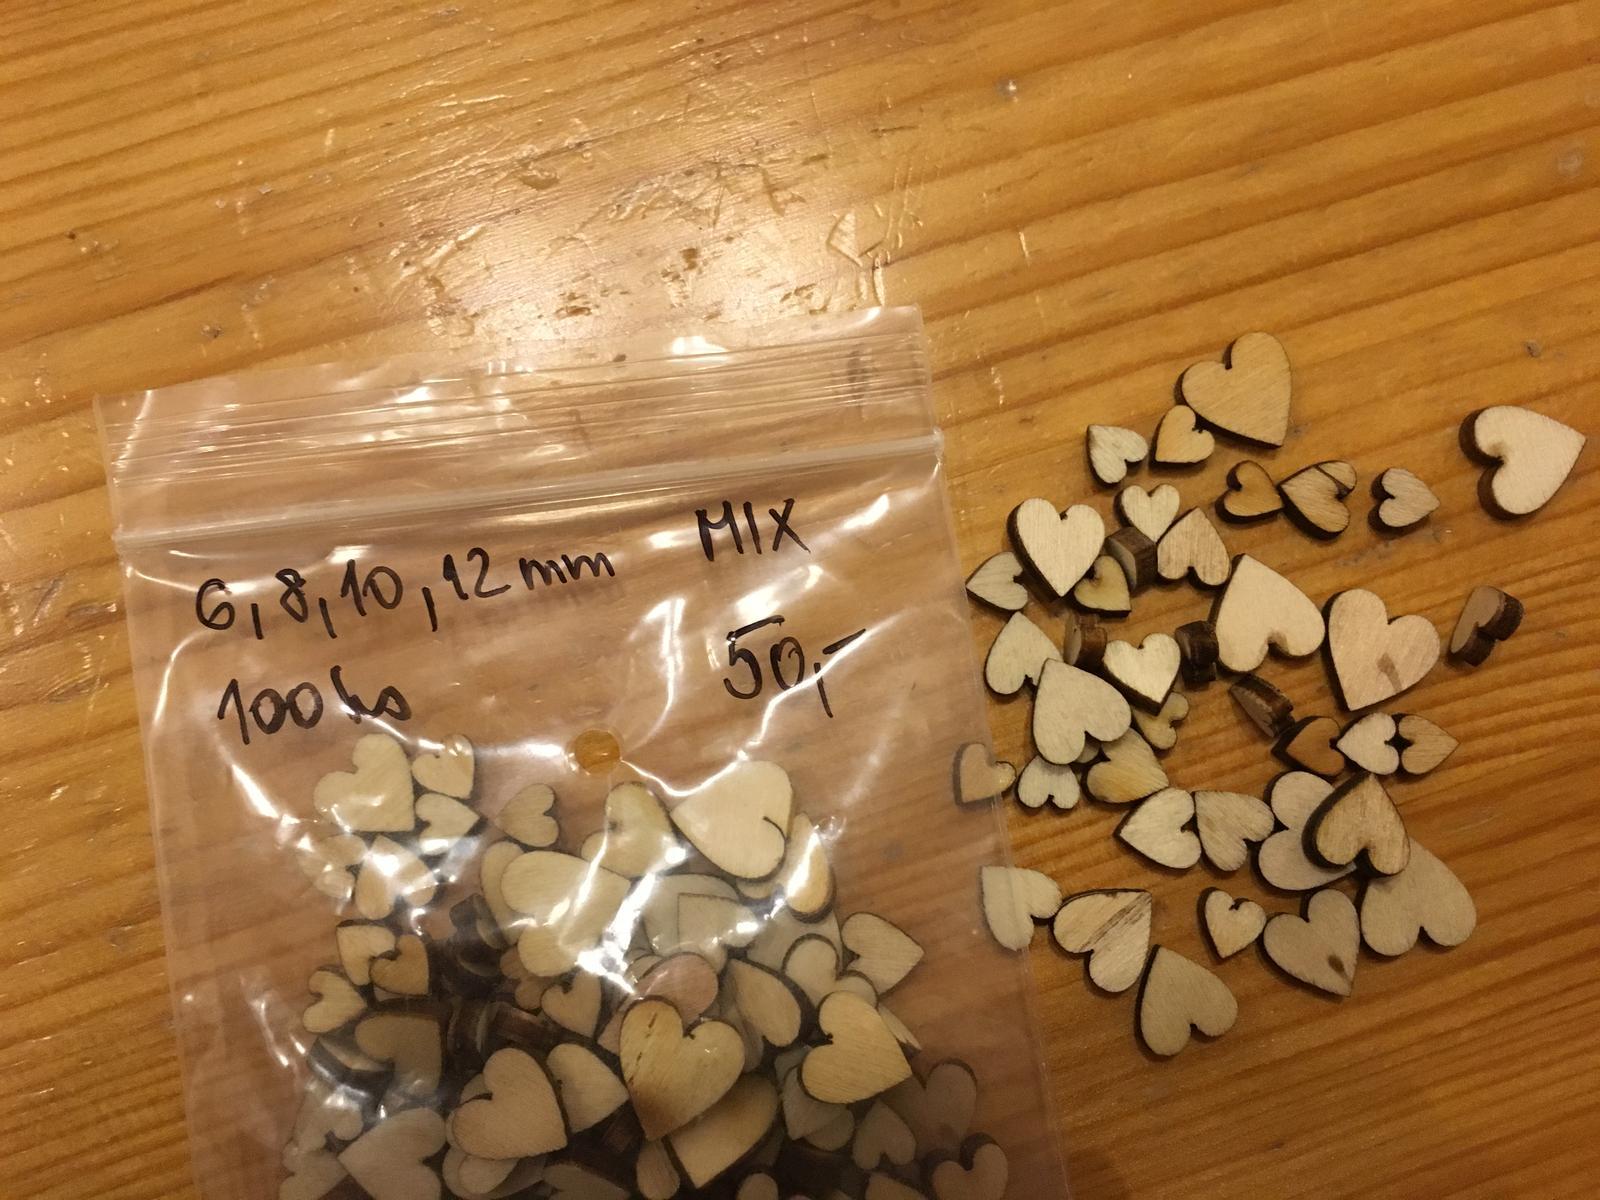 Mix drevenych srdicek- 6,8,10,12 mm, 100 ks - Obrázek č. 1